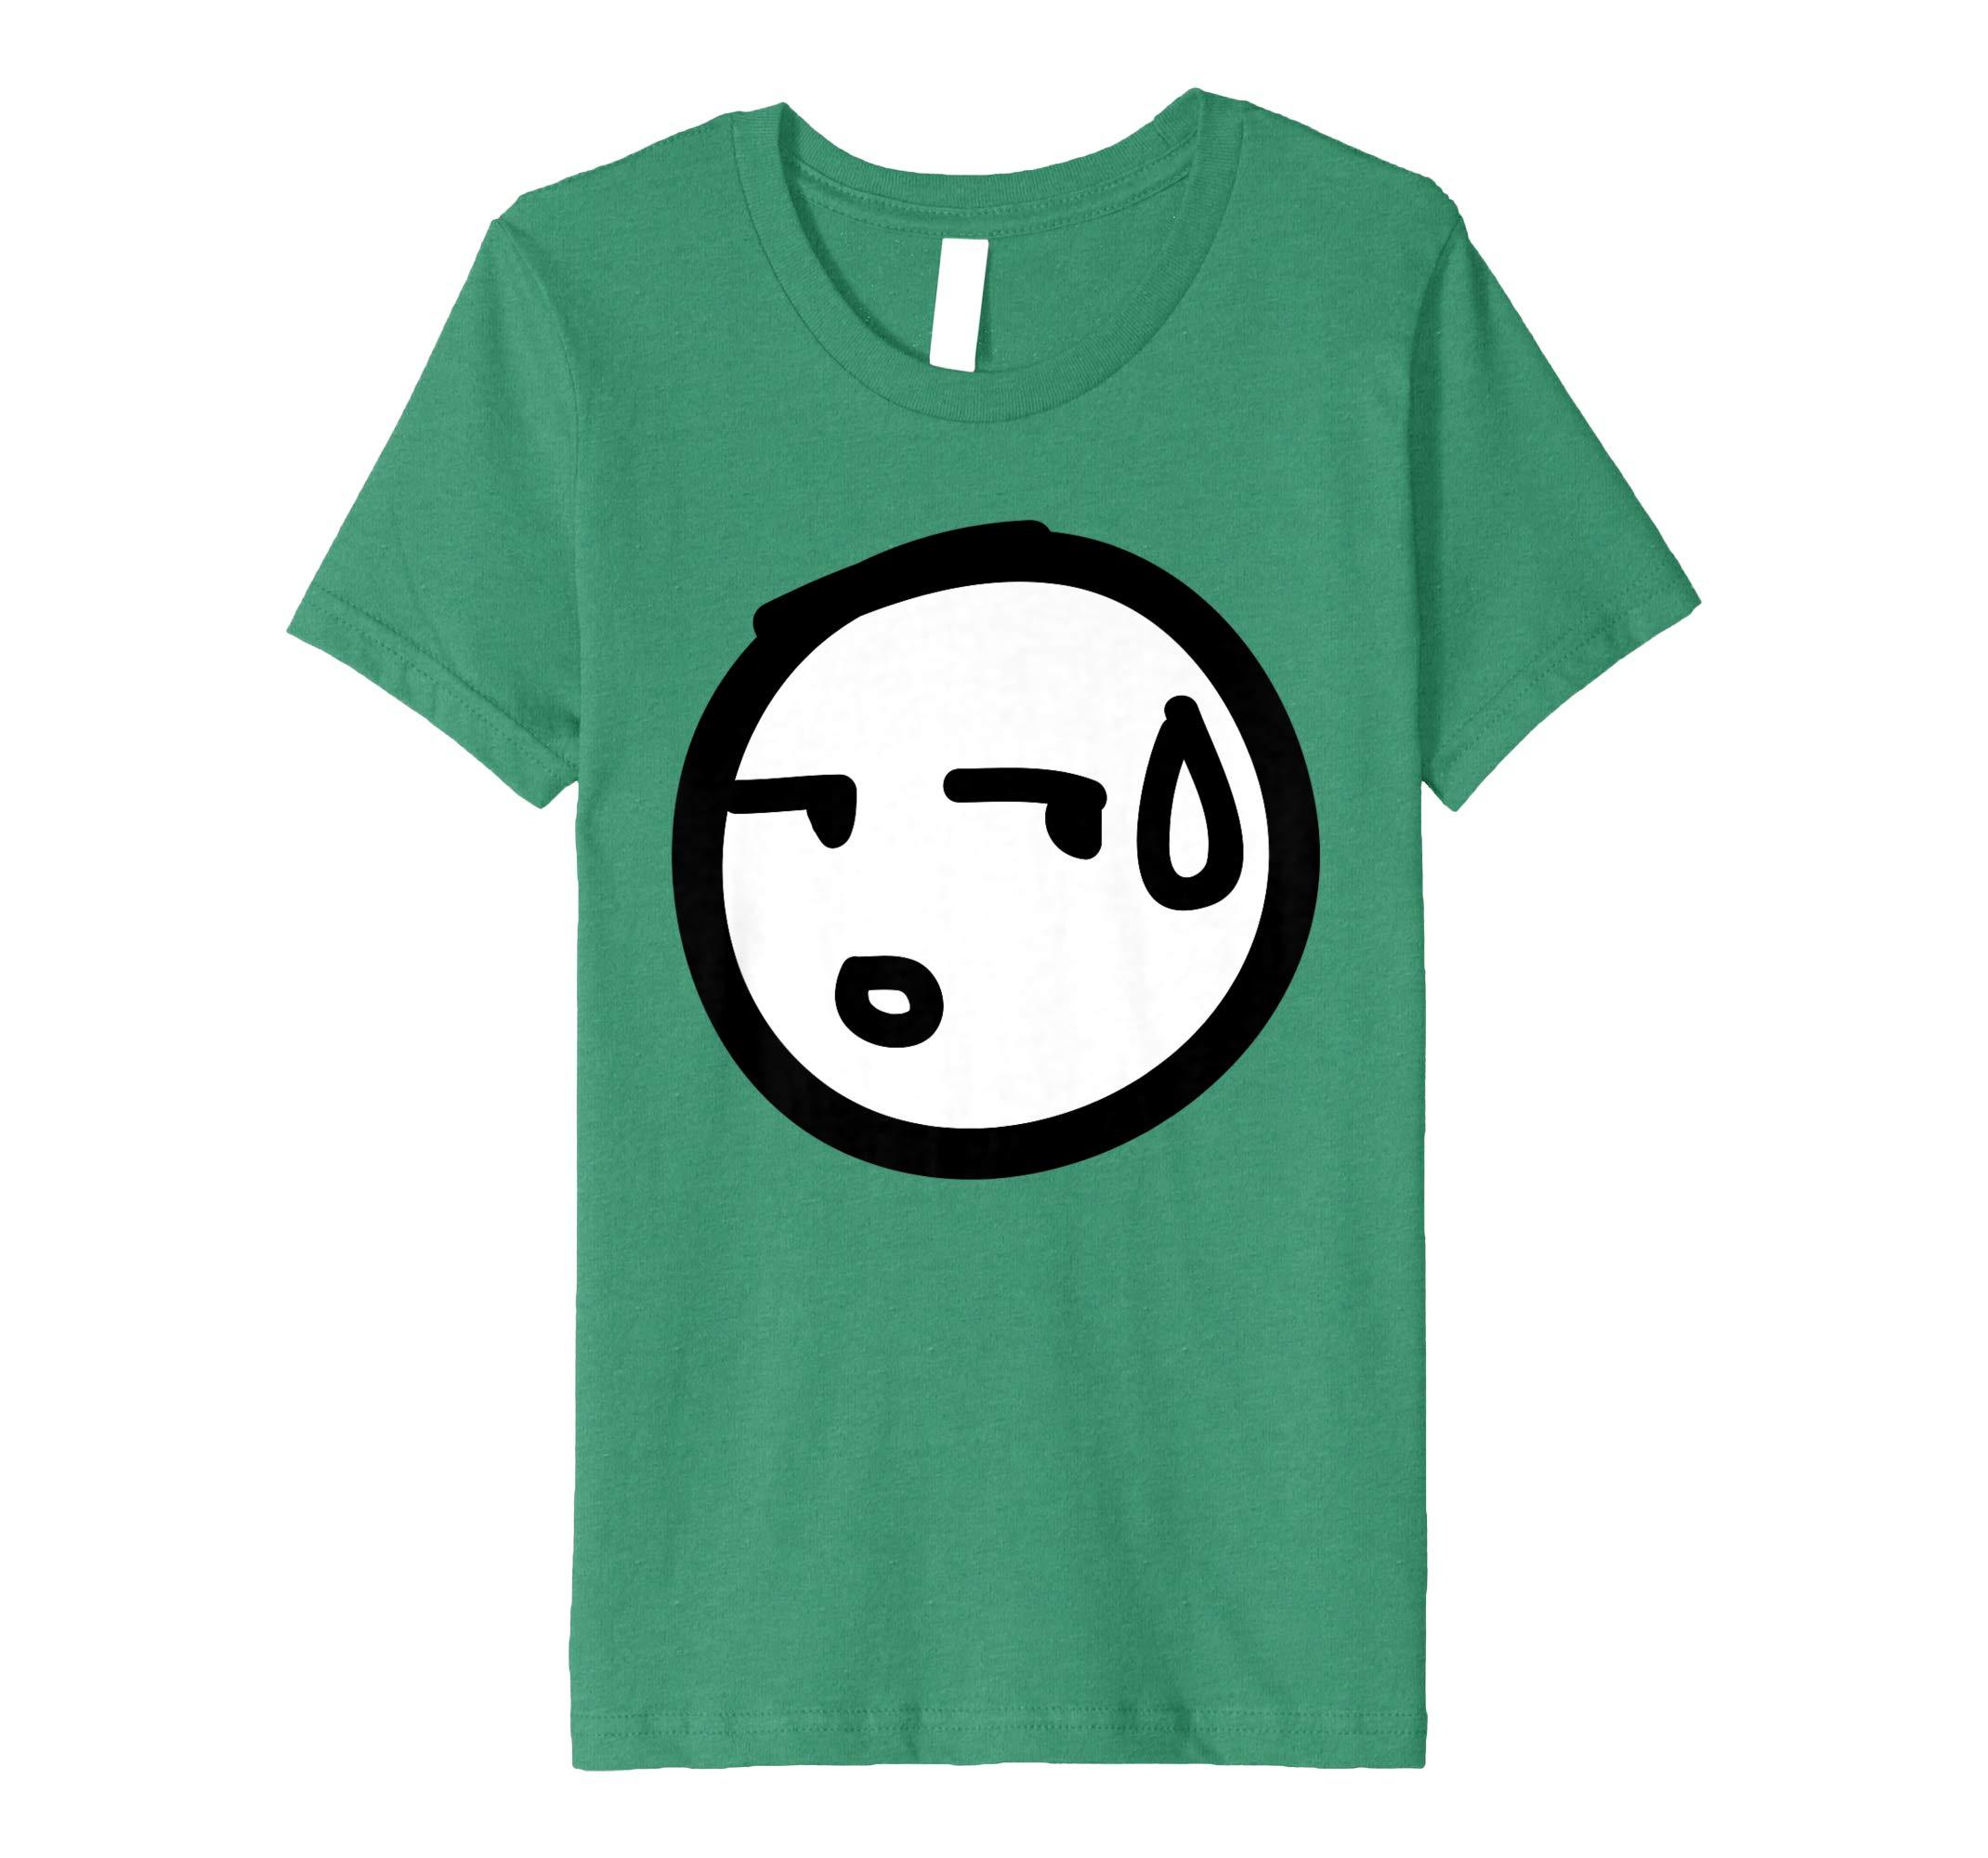 2140x2000 Kawaii Anime Emoji Sideways Sweat Face Drawing T Shirt